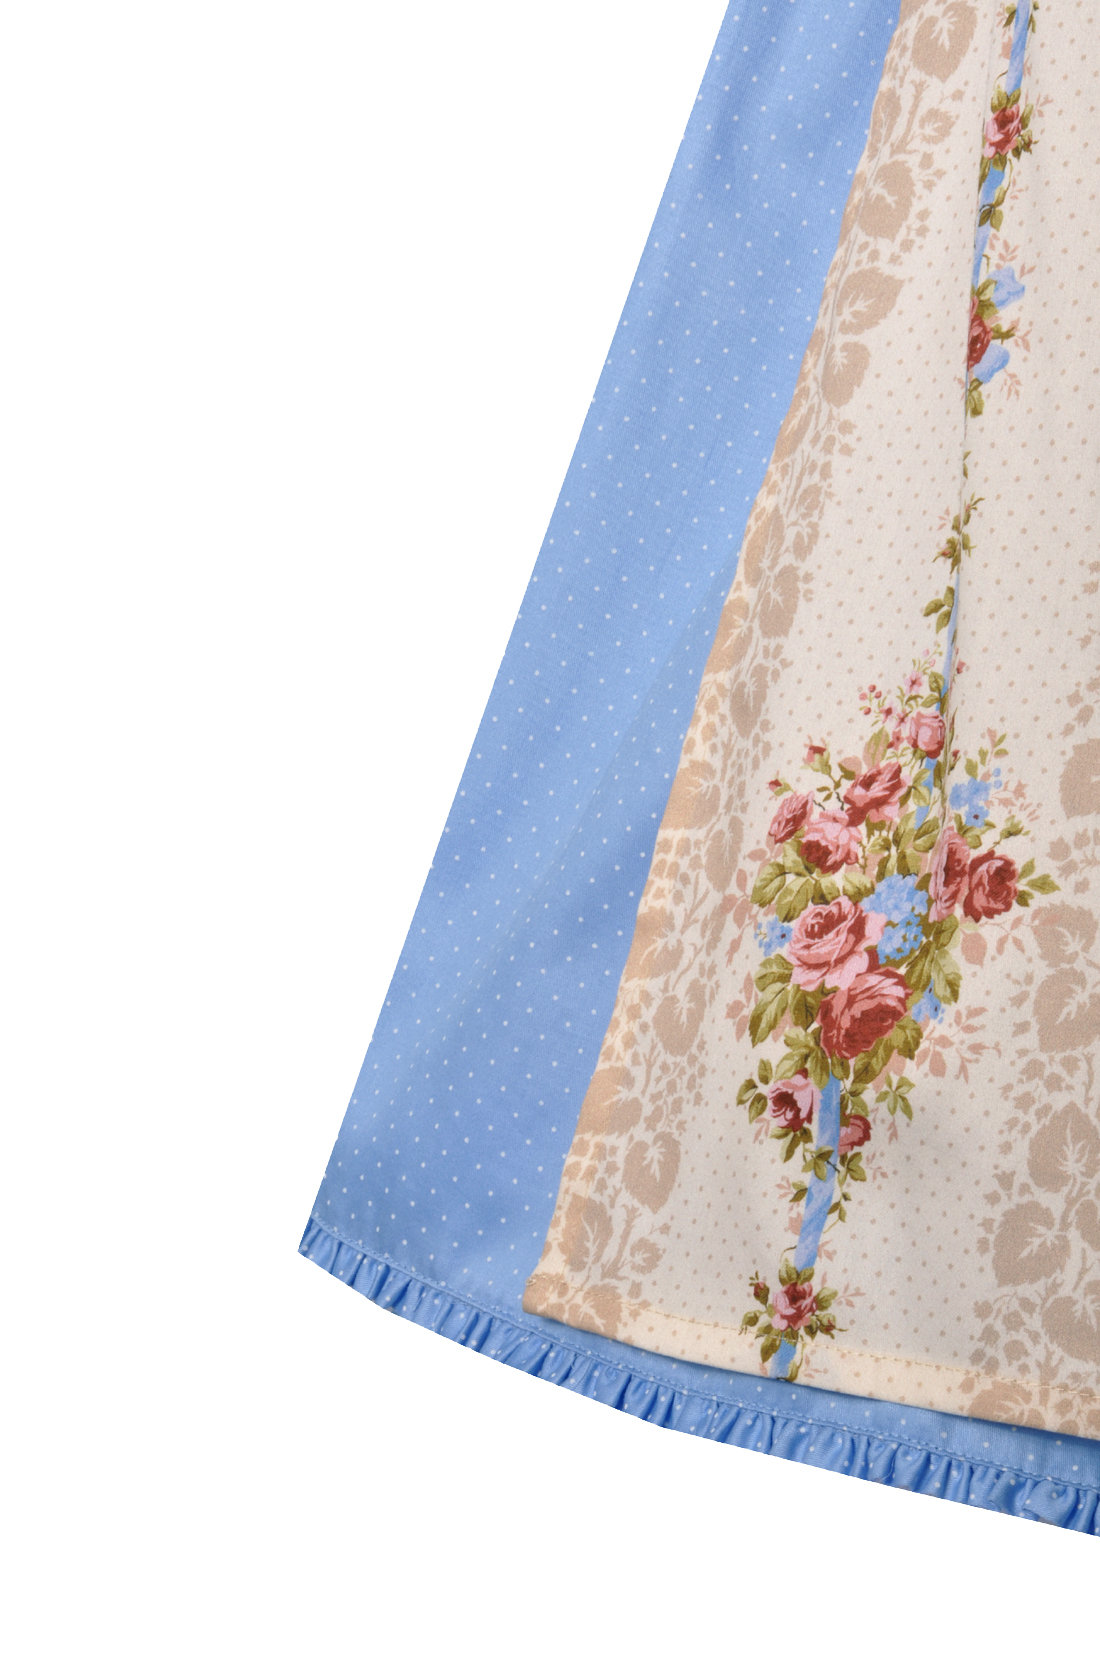 Du midi 60 cm Frasdorf bleu bleu clair avec des fleurs tablier alpenfee